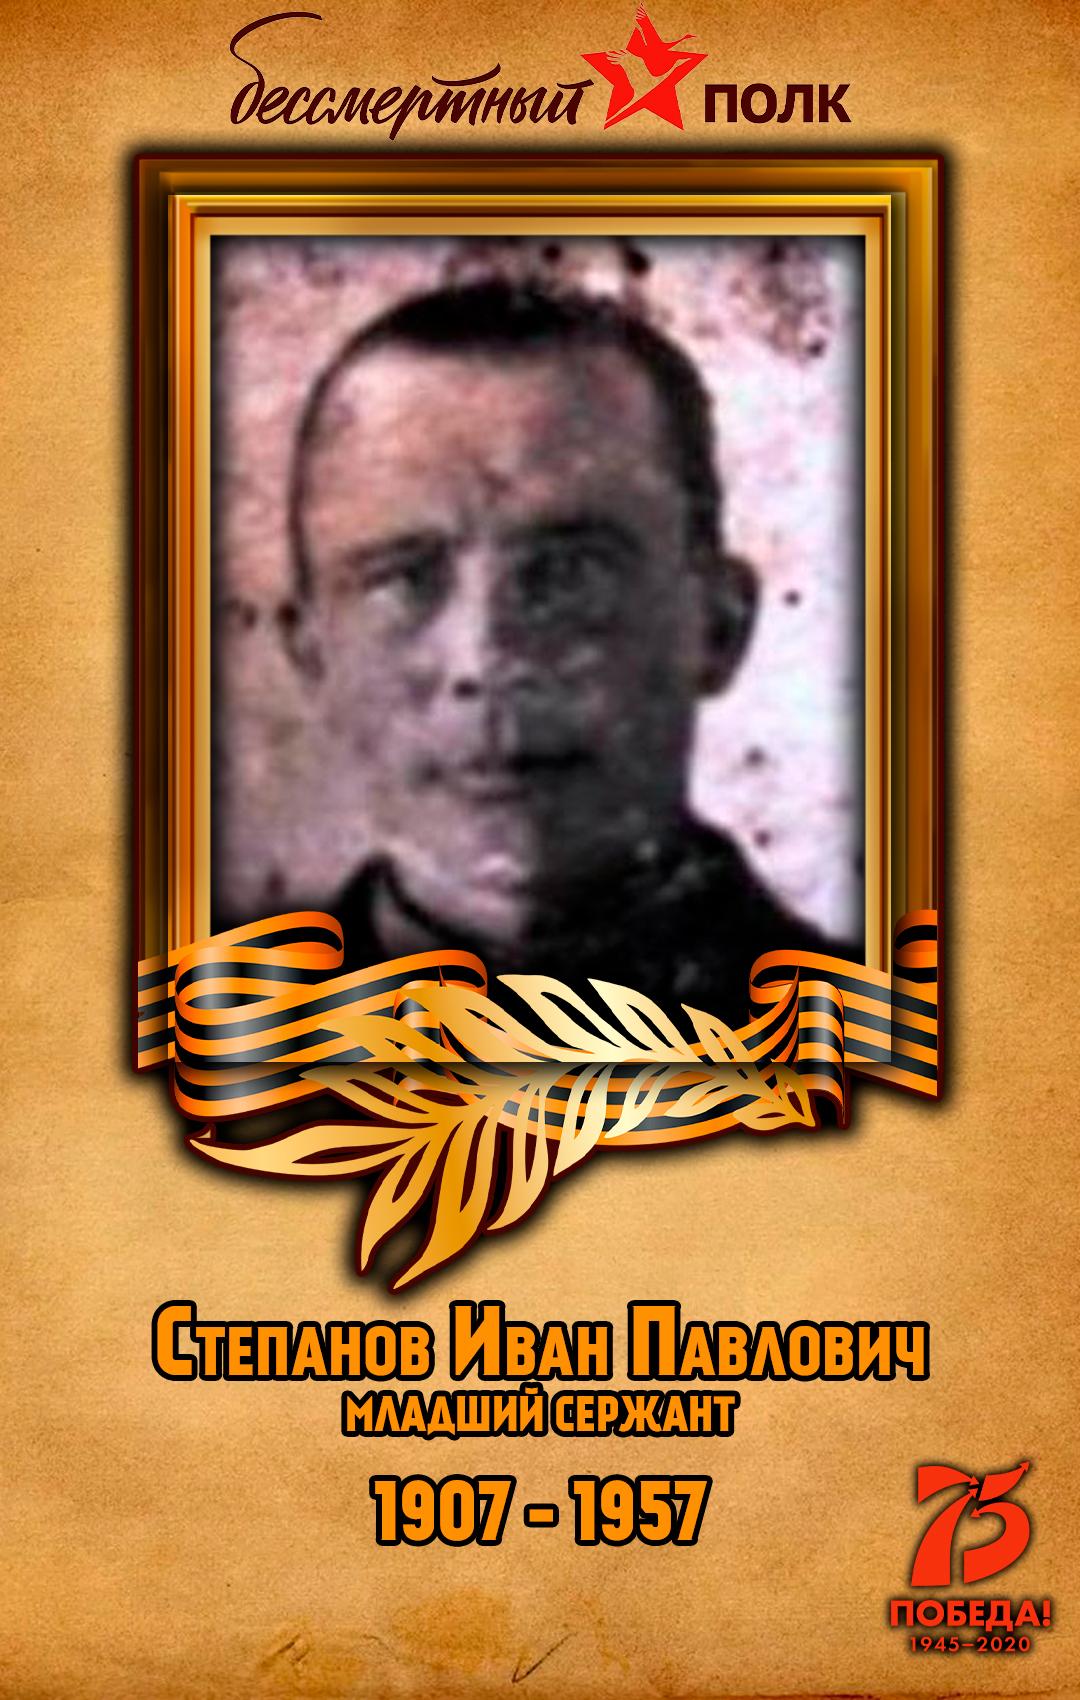 Степанов-Иван-Павлович